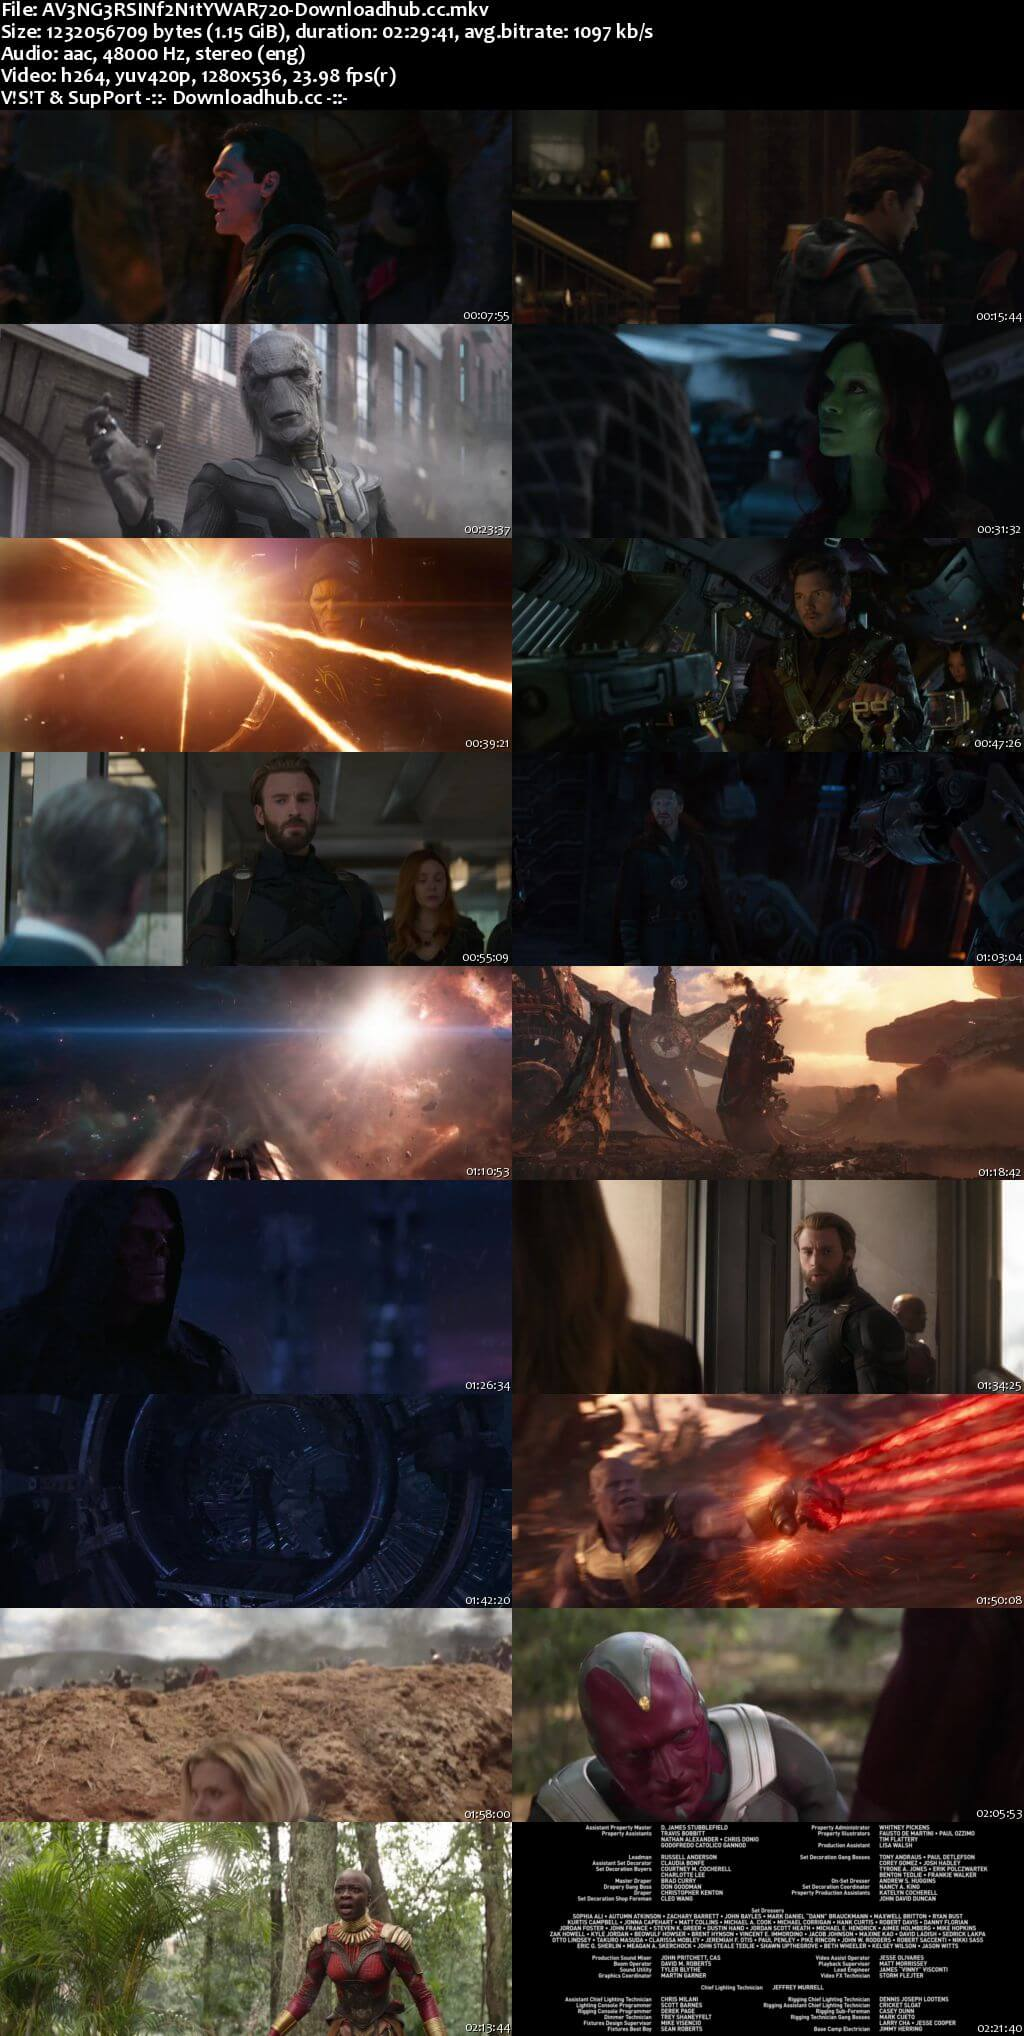 Avengers Infinity War 2018 English 720p Web-DL 1.1GB